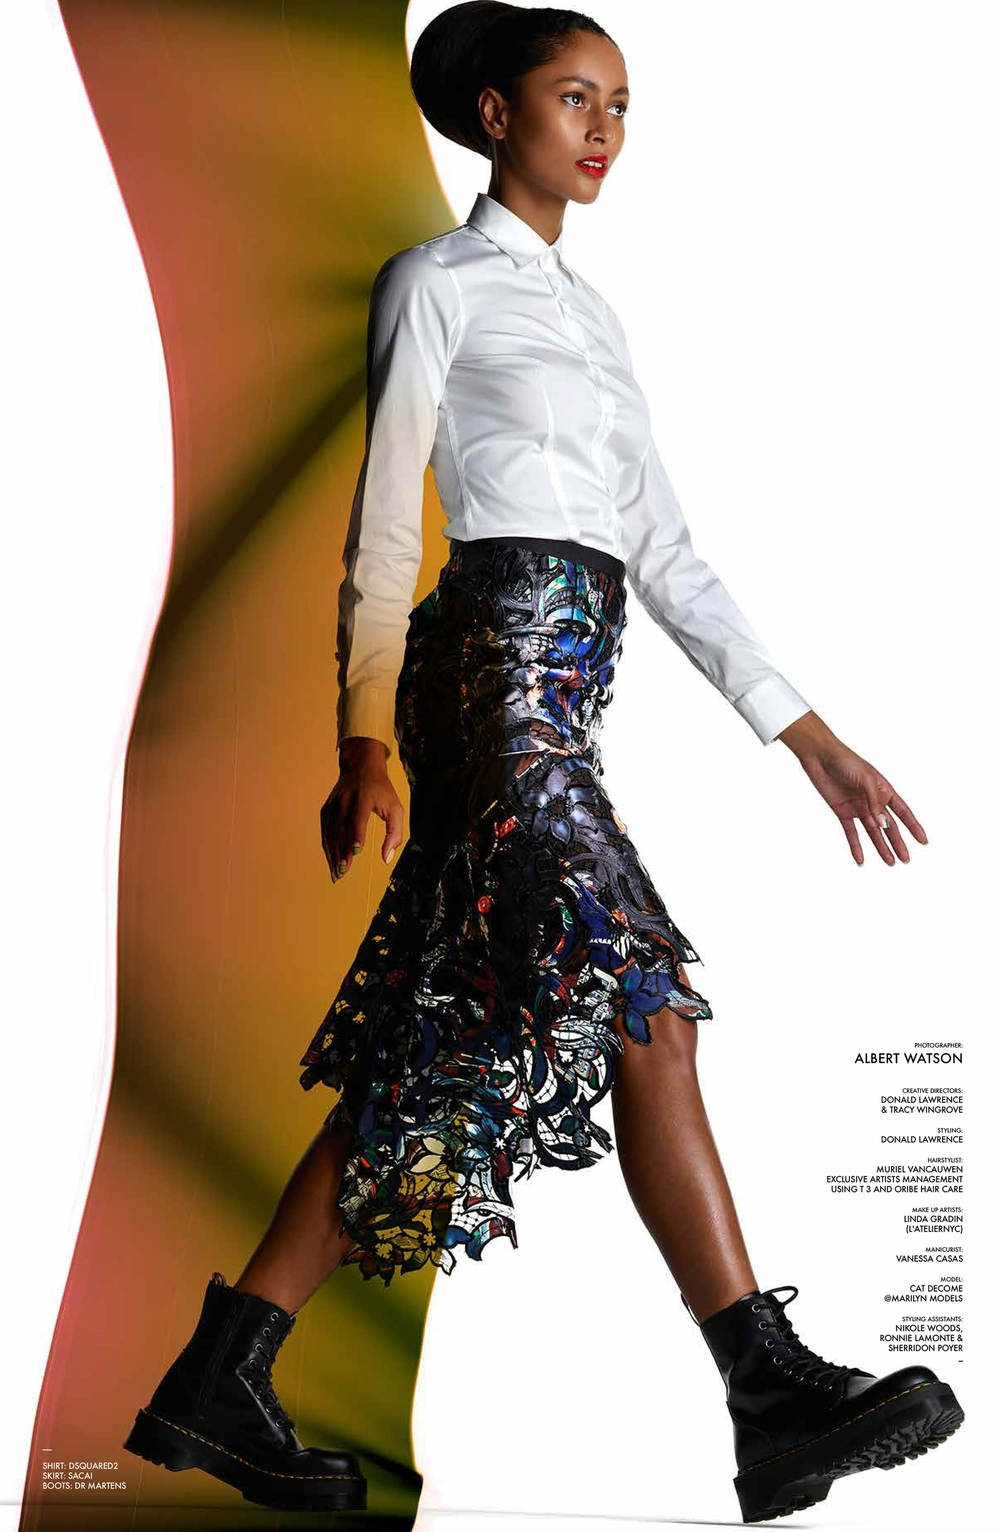 Amazing+Magazine+#33-57+copy.jpg